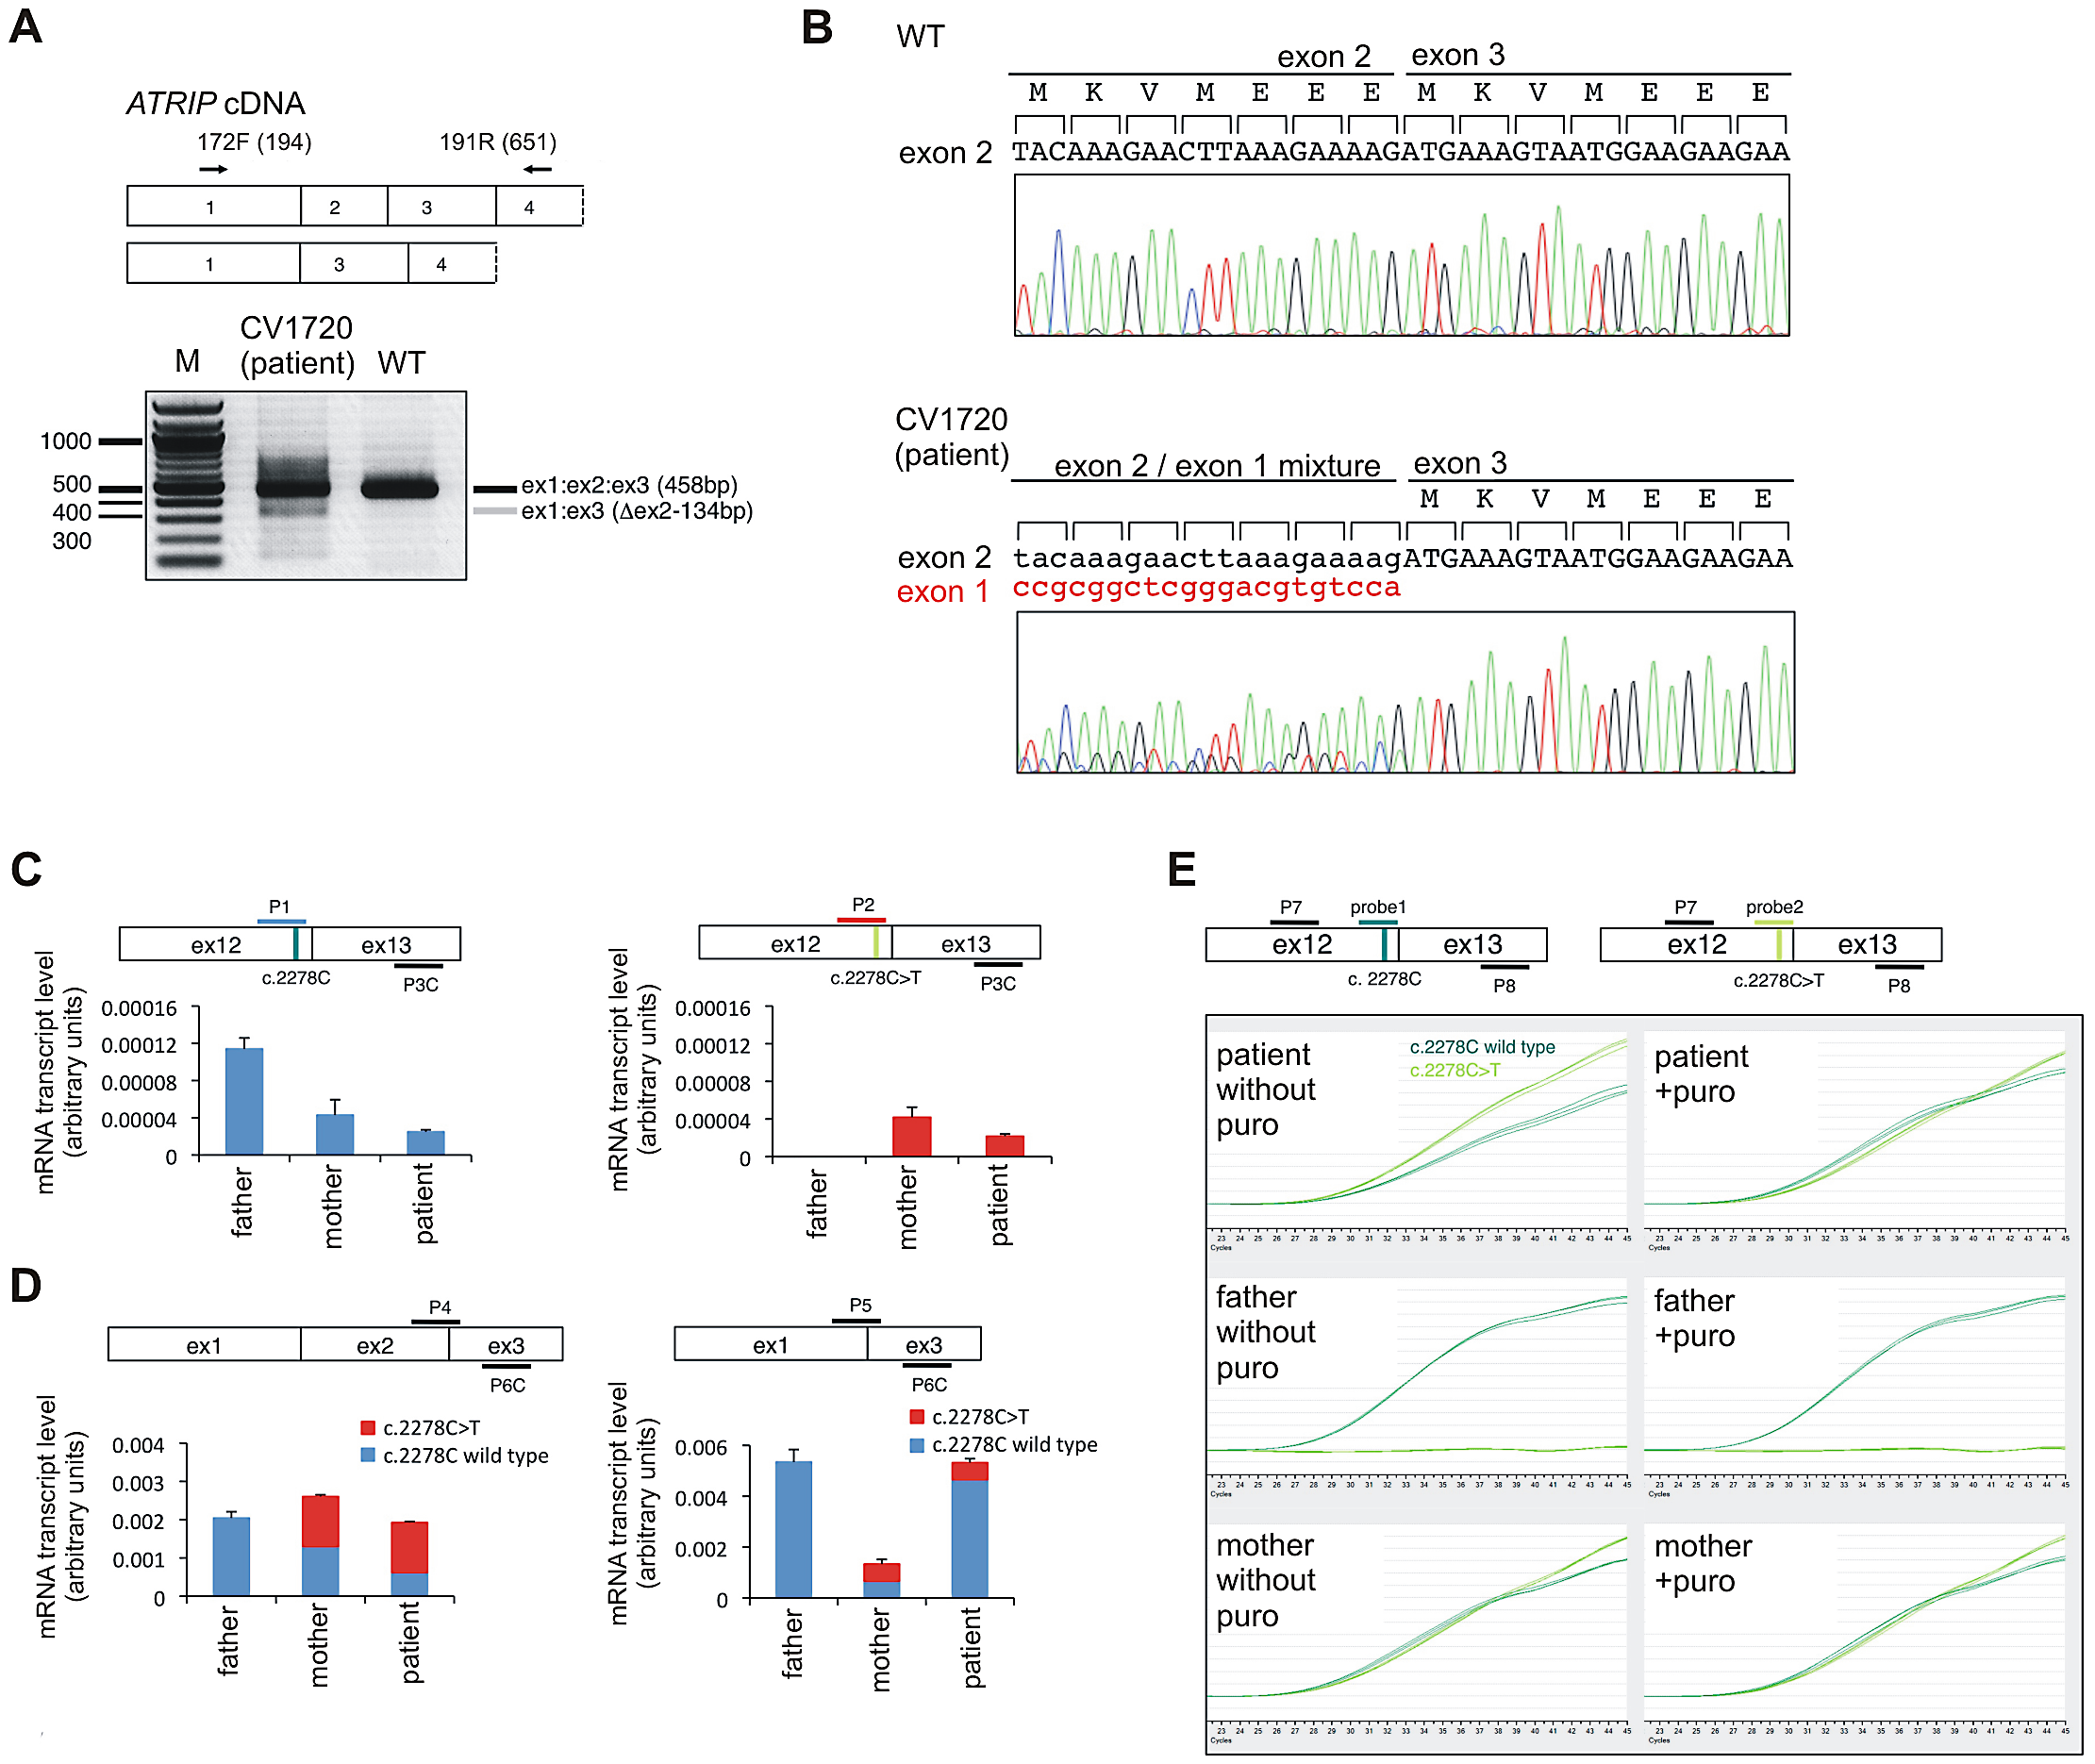 Identification of mutational changes in <i>ATRIP</i> in CV1720.